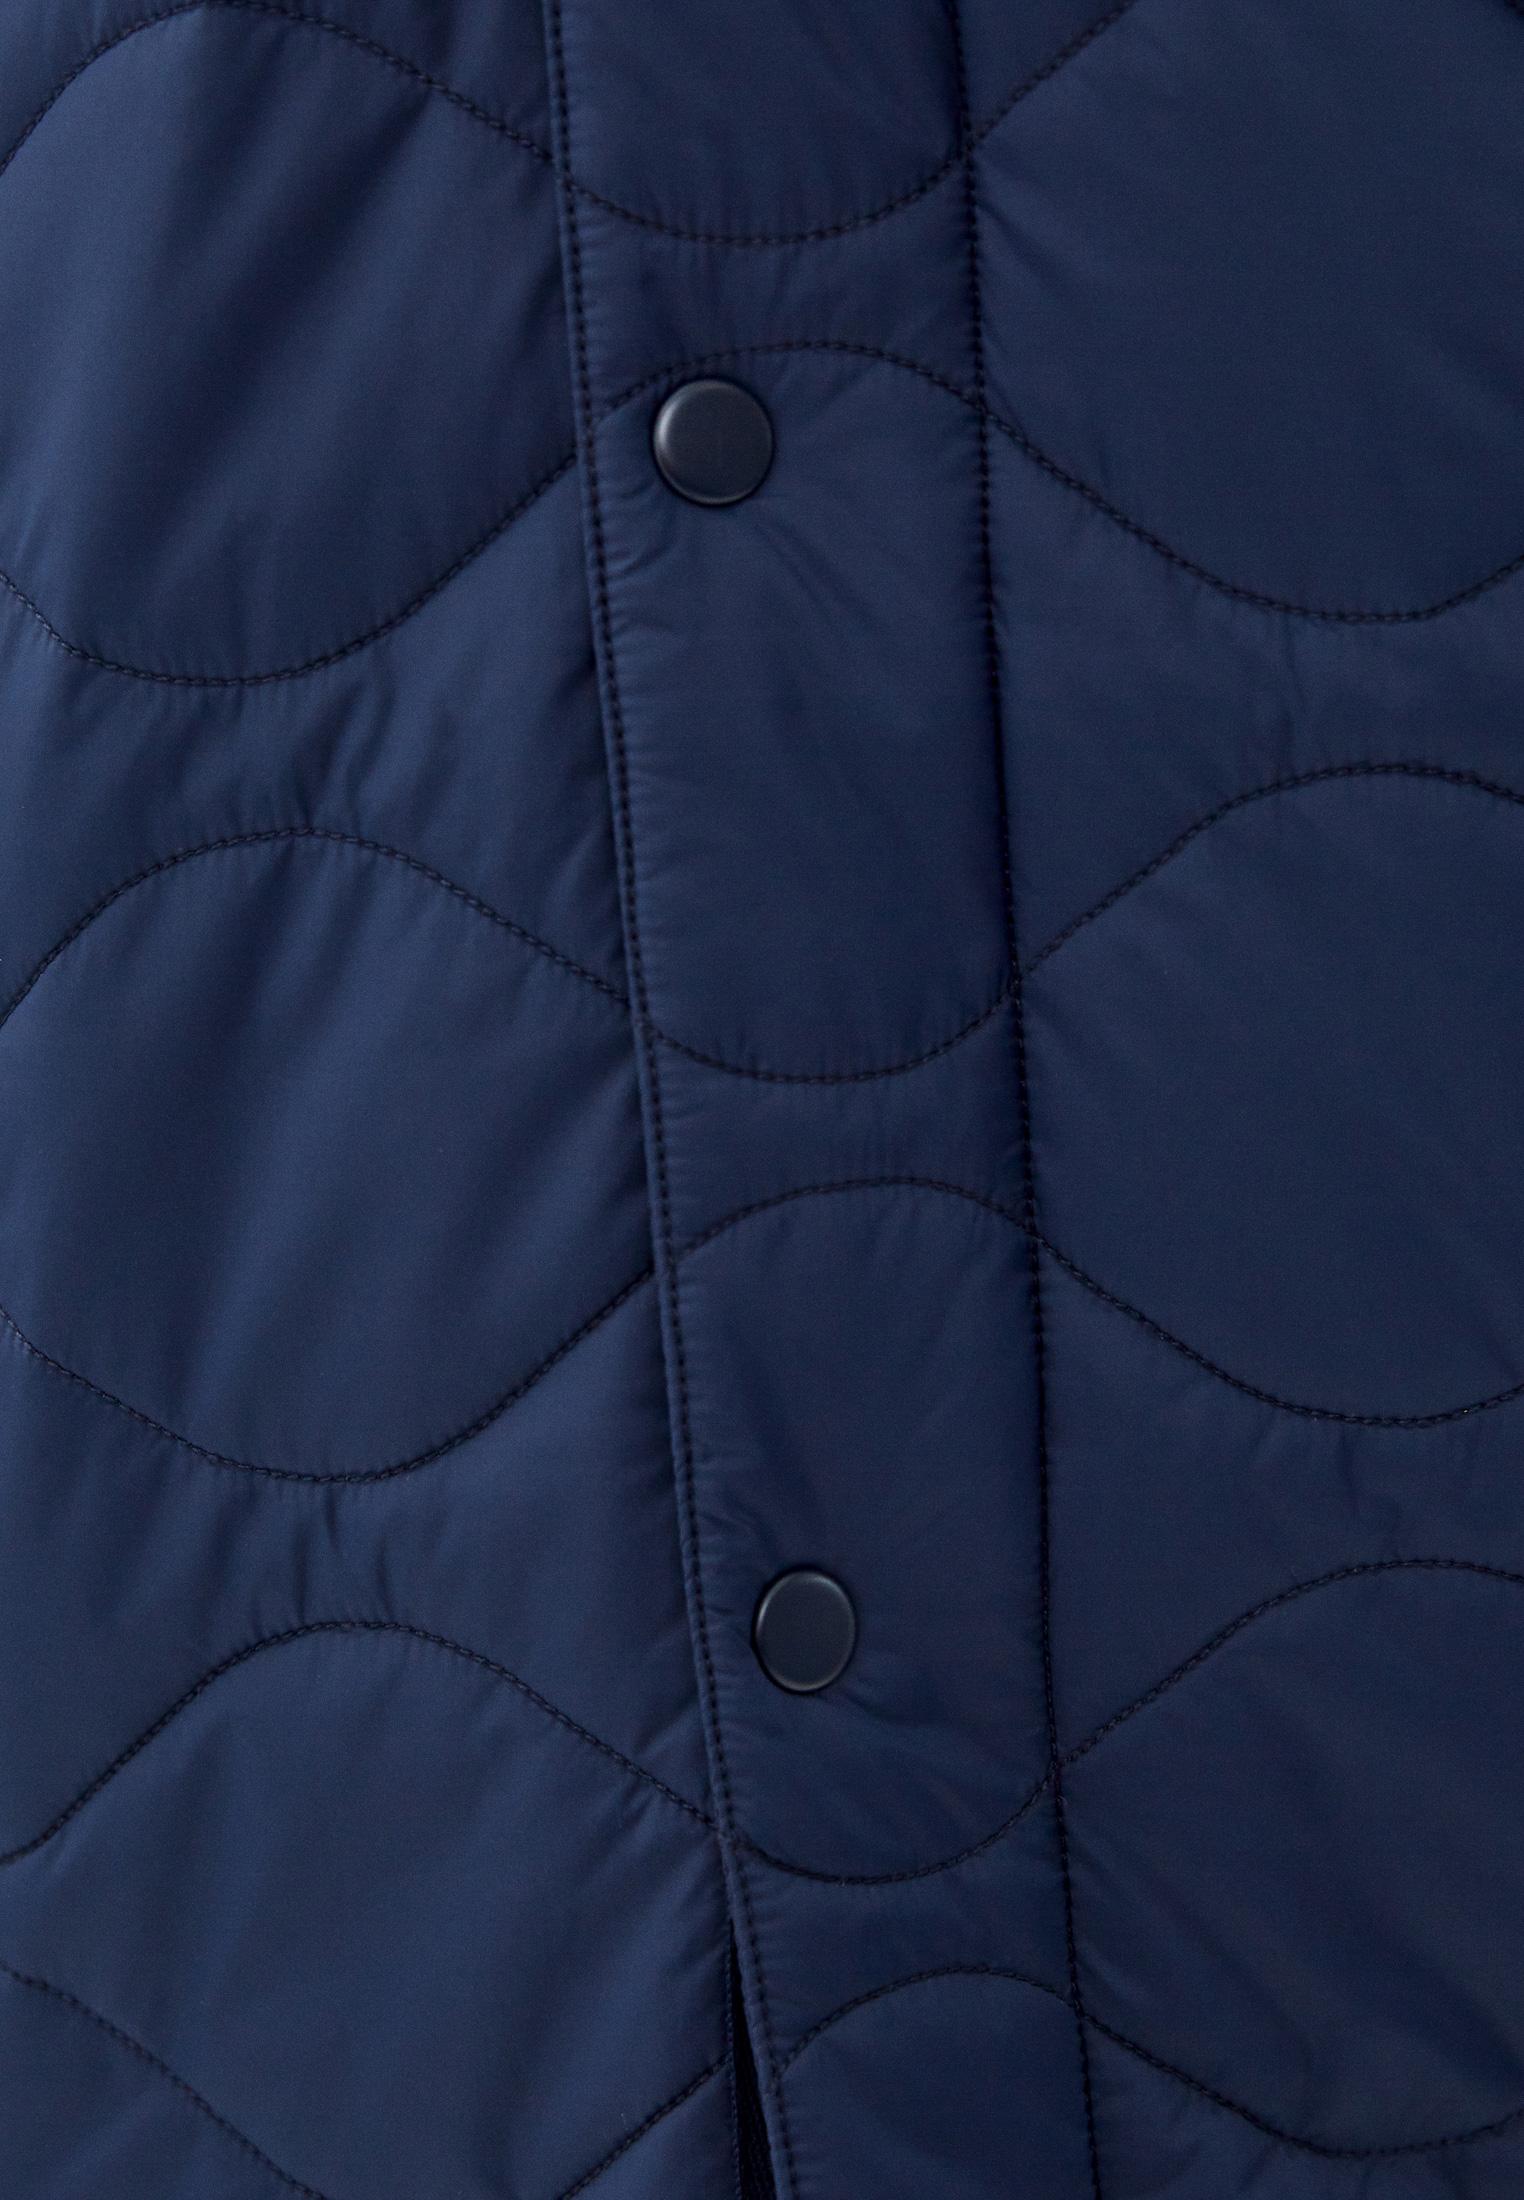 Куртка VANS VA457OLKZ: изображение 5